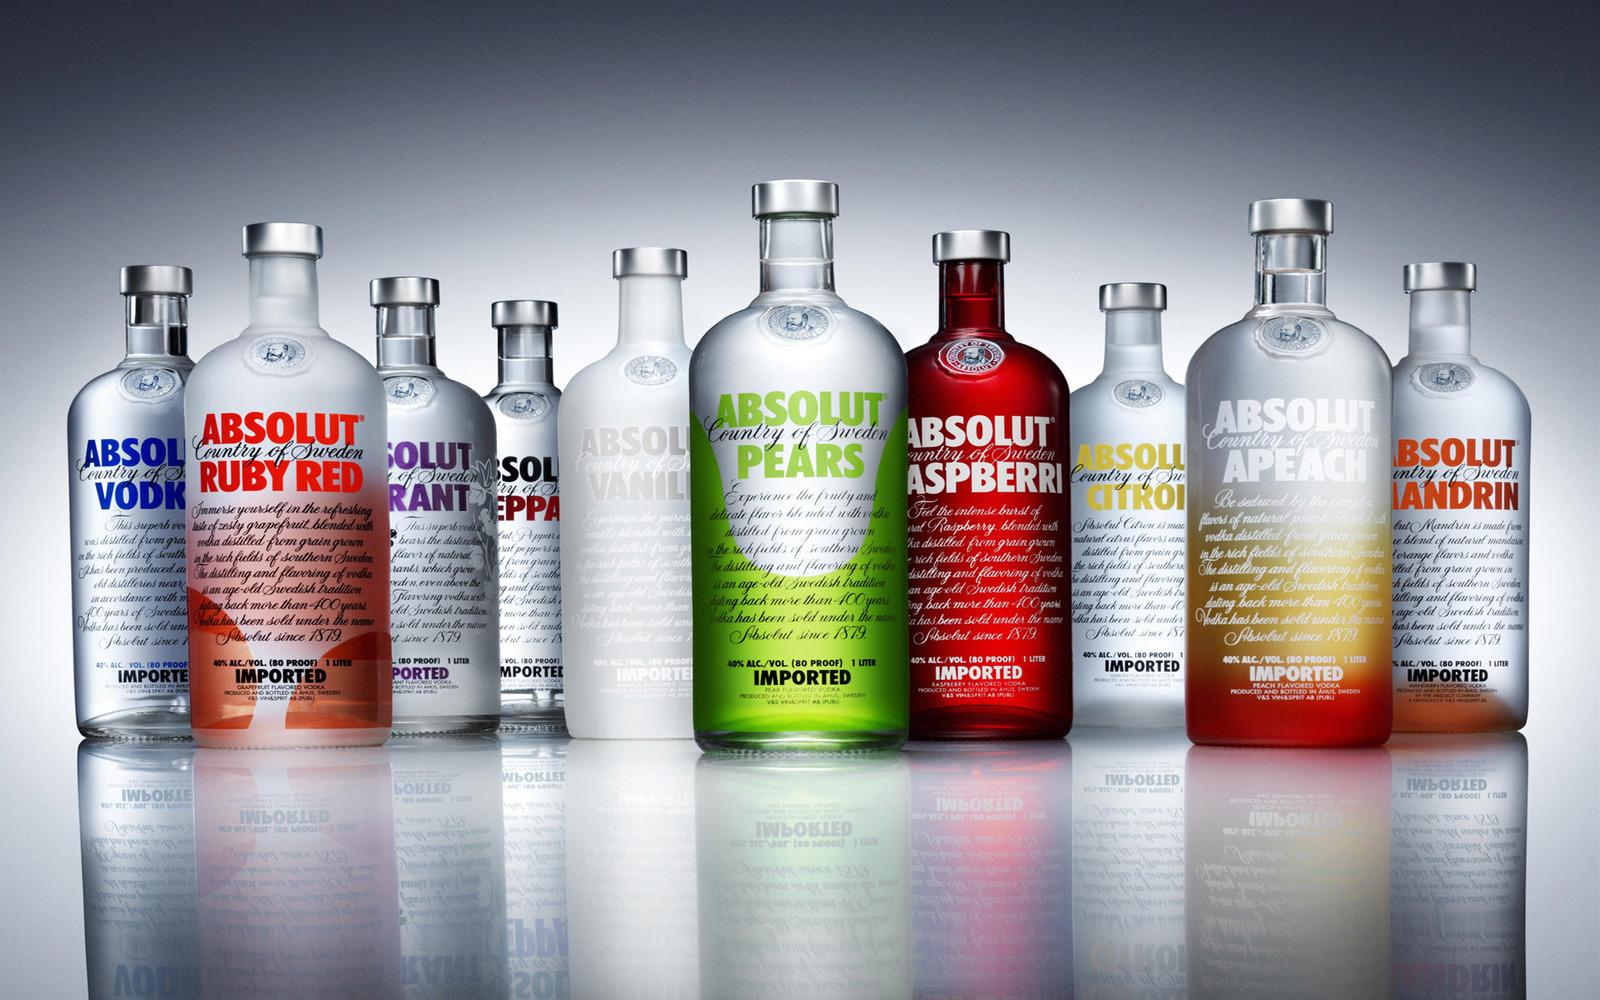 absolut vodka family